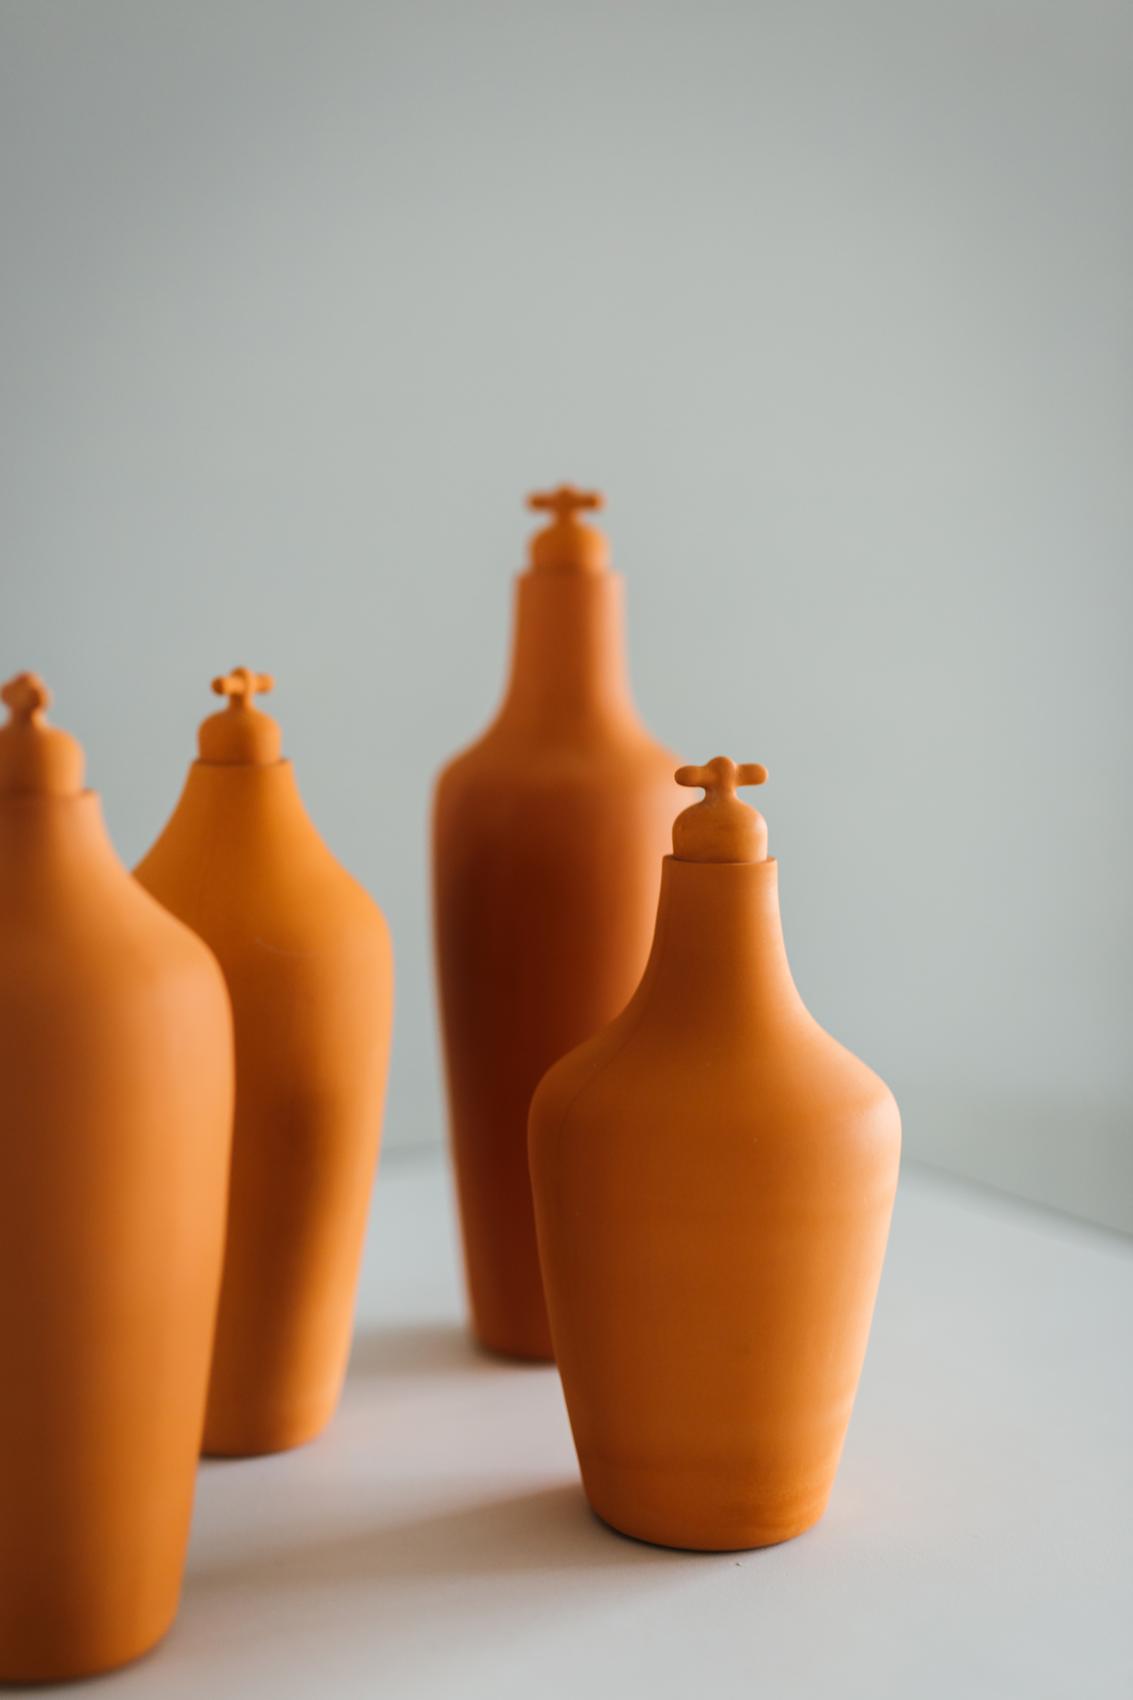 Vij5 Tap Water Carafe Terracotta Karaf Set Van 3 Image Ingrid Hofstra